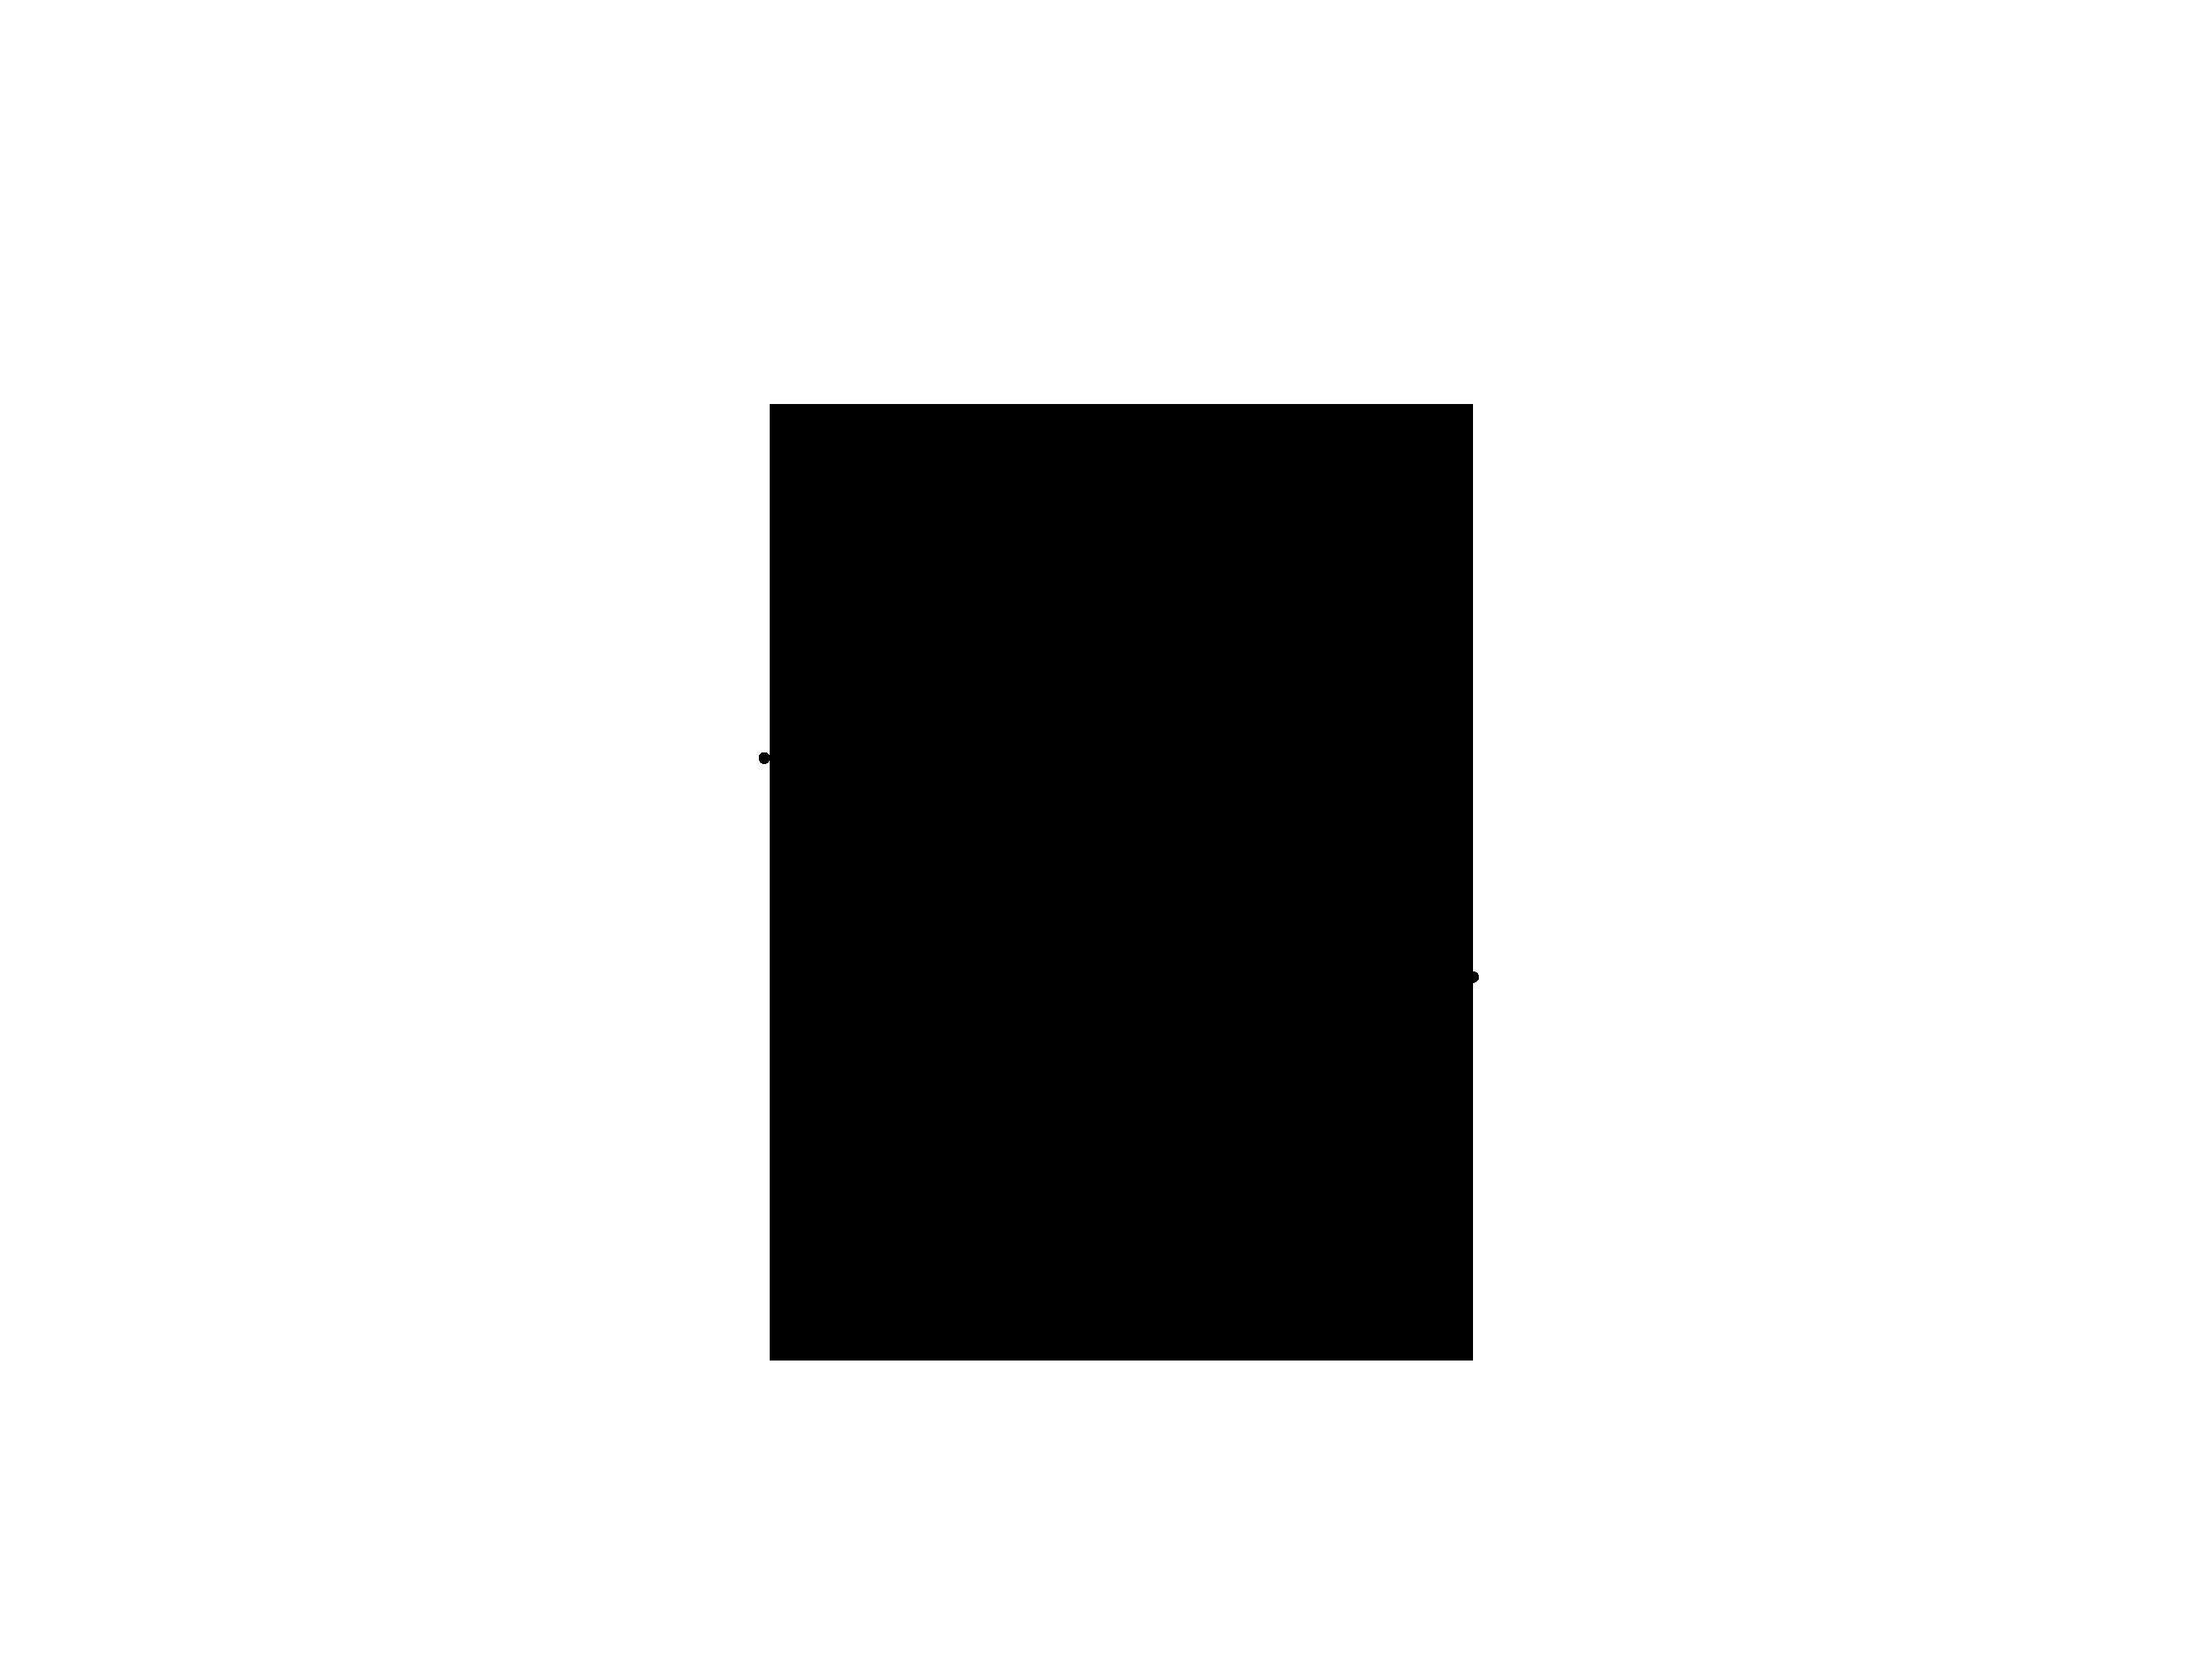 ramas_2-negroo